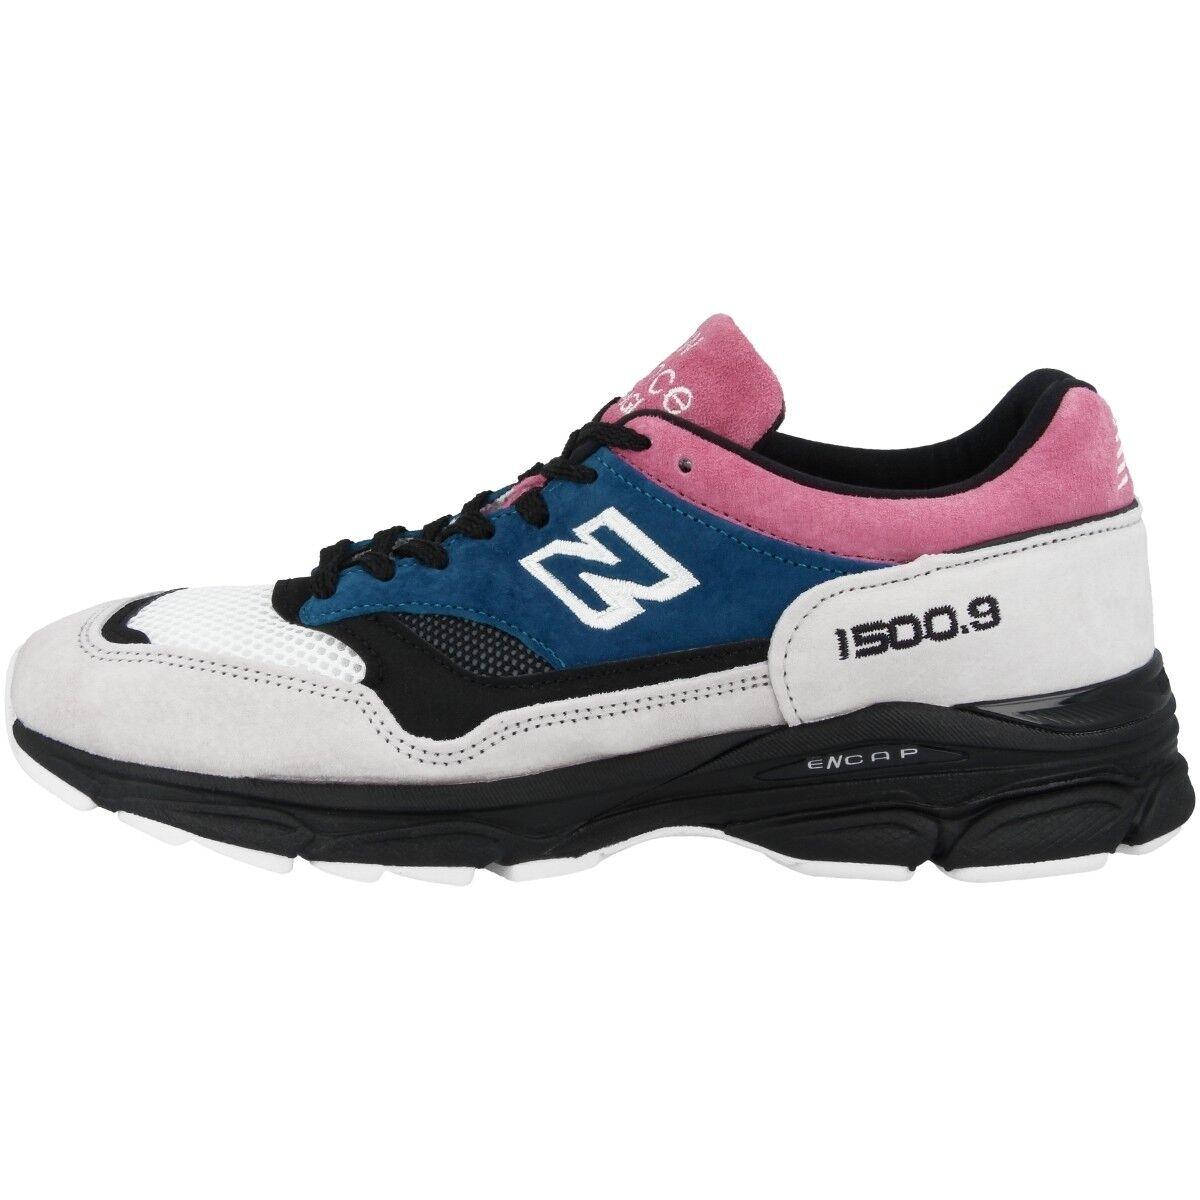 New Balance M 1500.9 SC Schuhe Made in England Sneaker pink Blau schwarz M15009SC